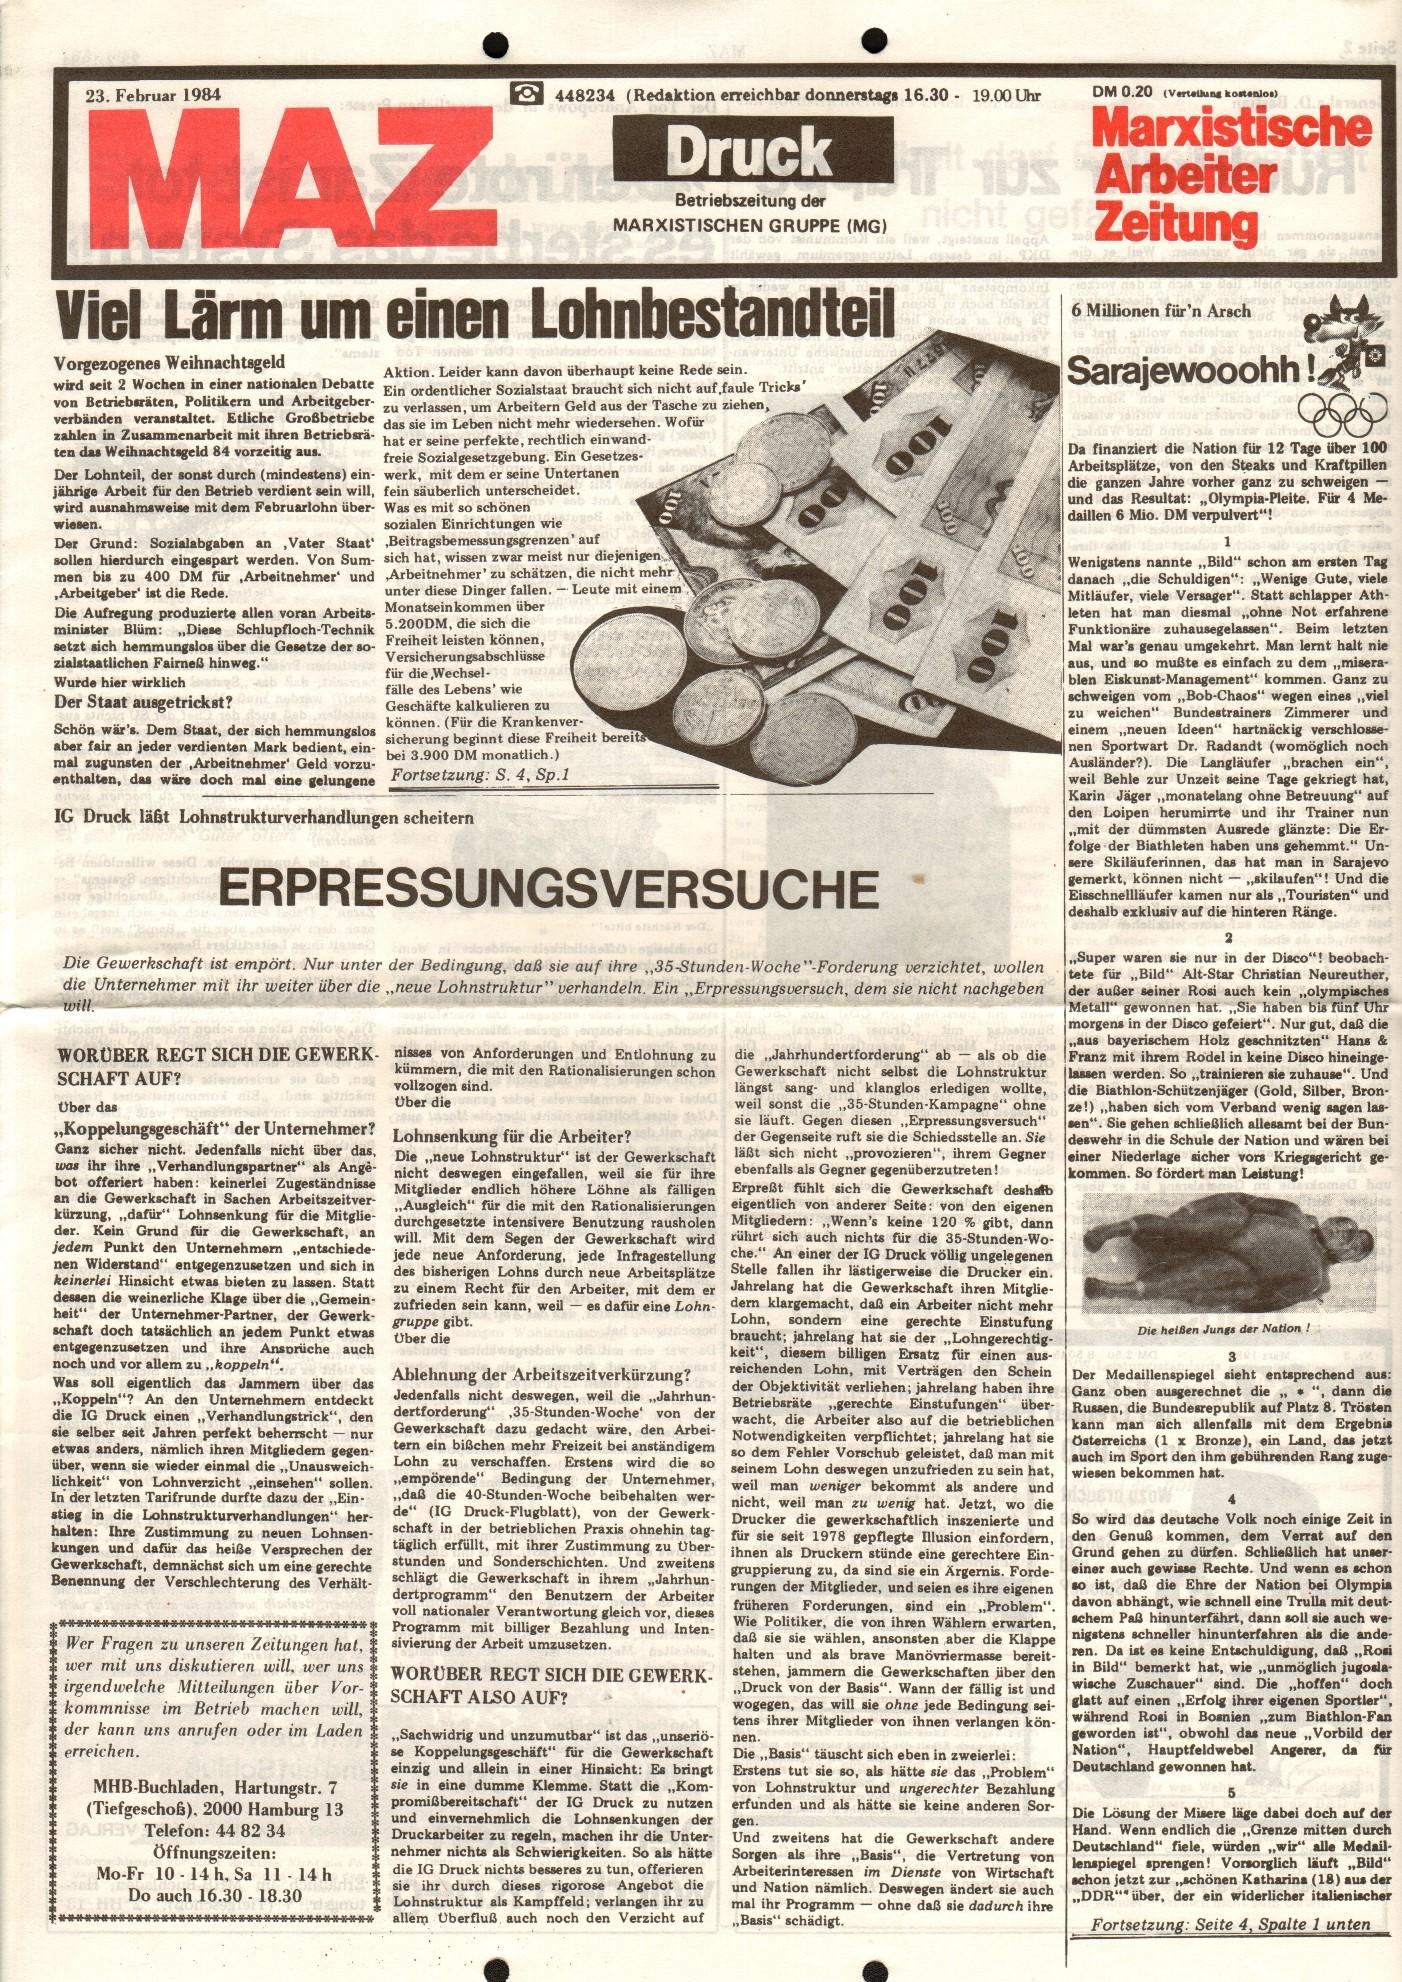 Hamburg_MG_MAZ_Druck_19840223_01